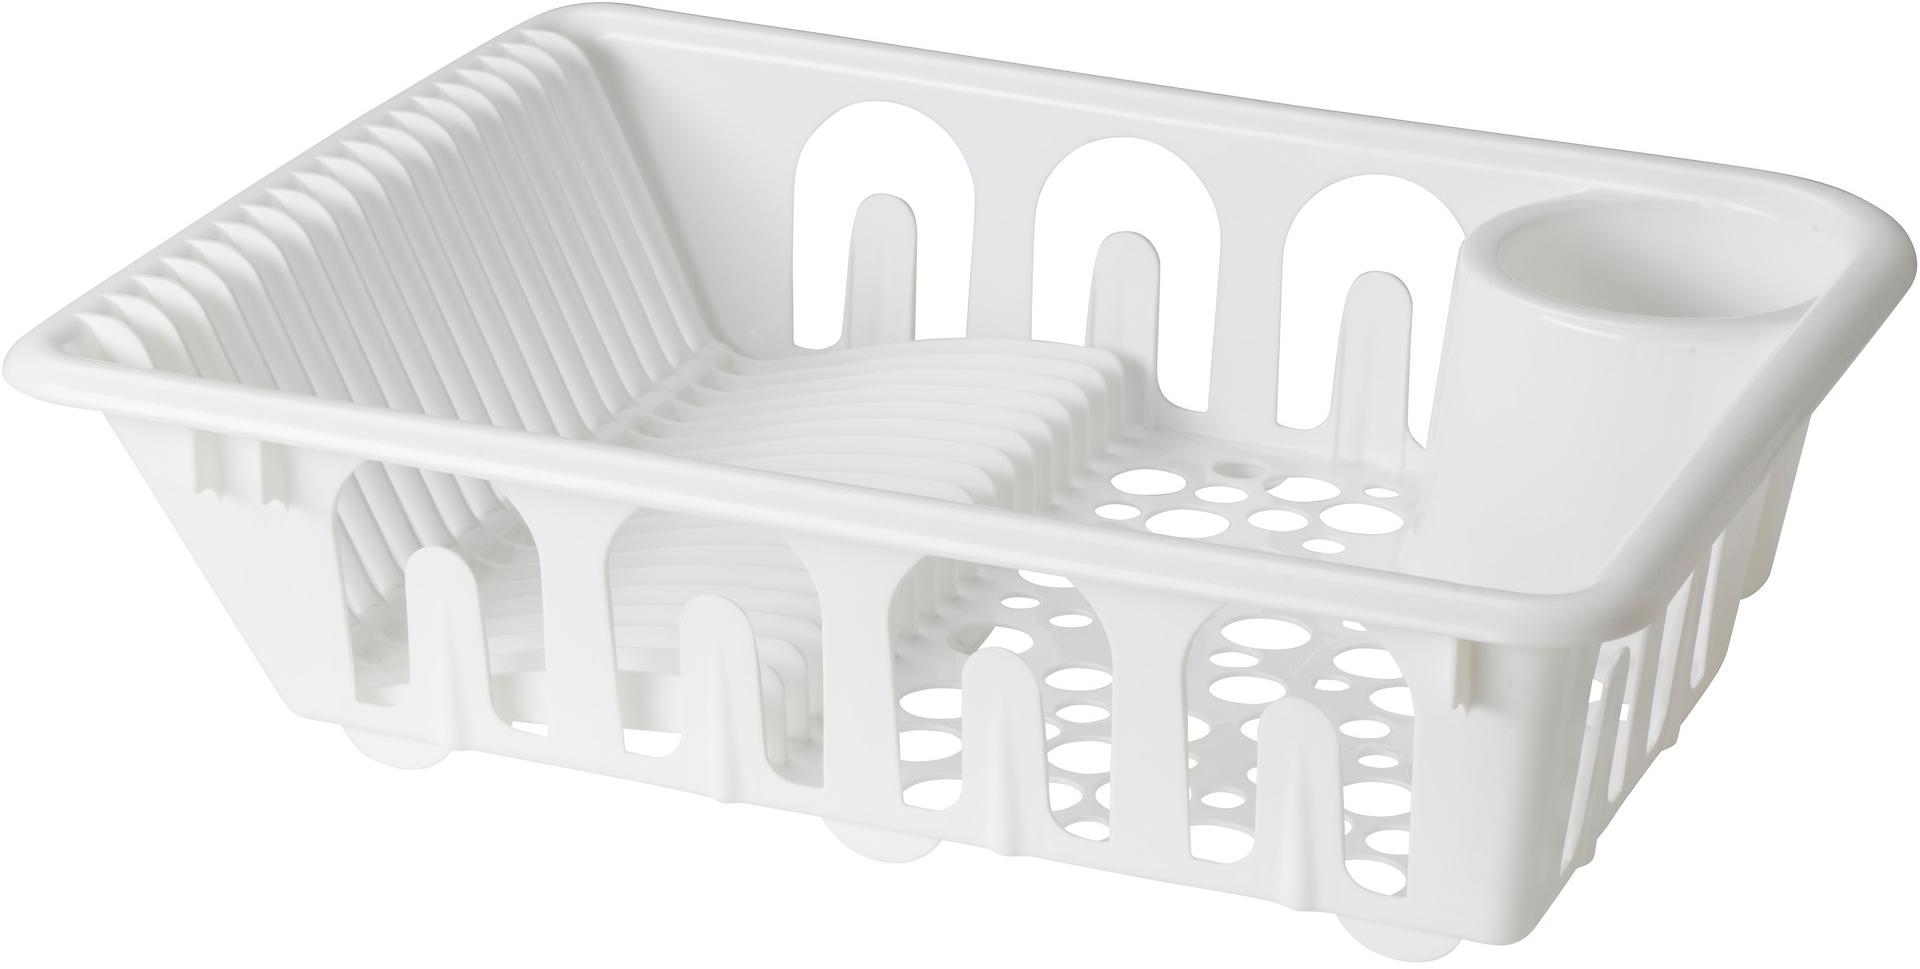 FLUNDRA Dish drainer - IKEA